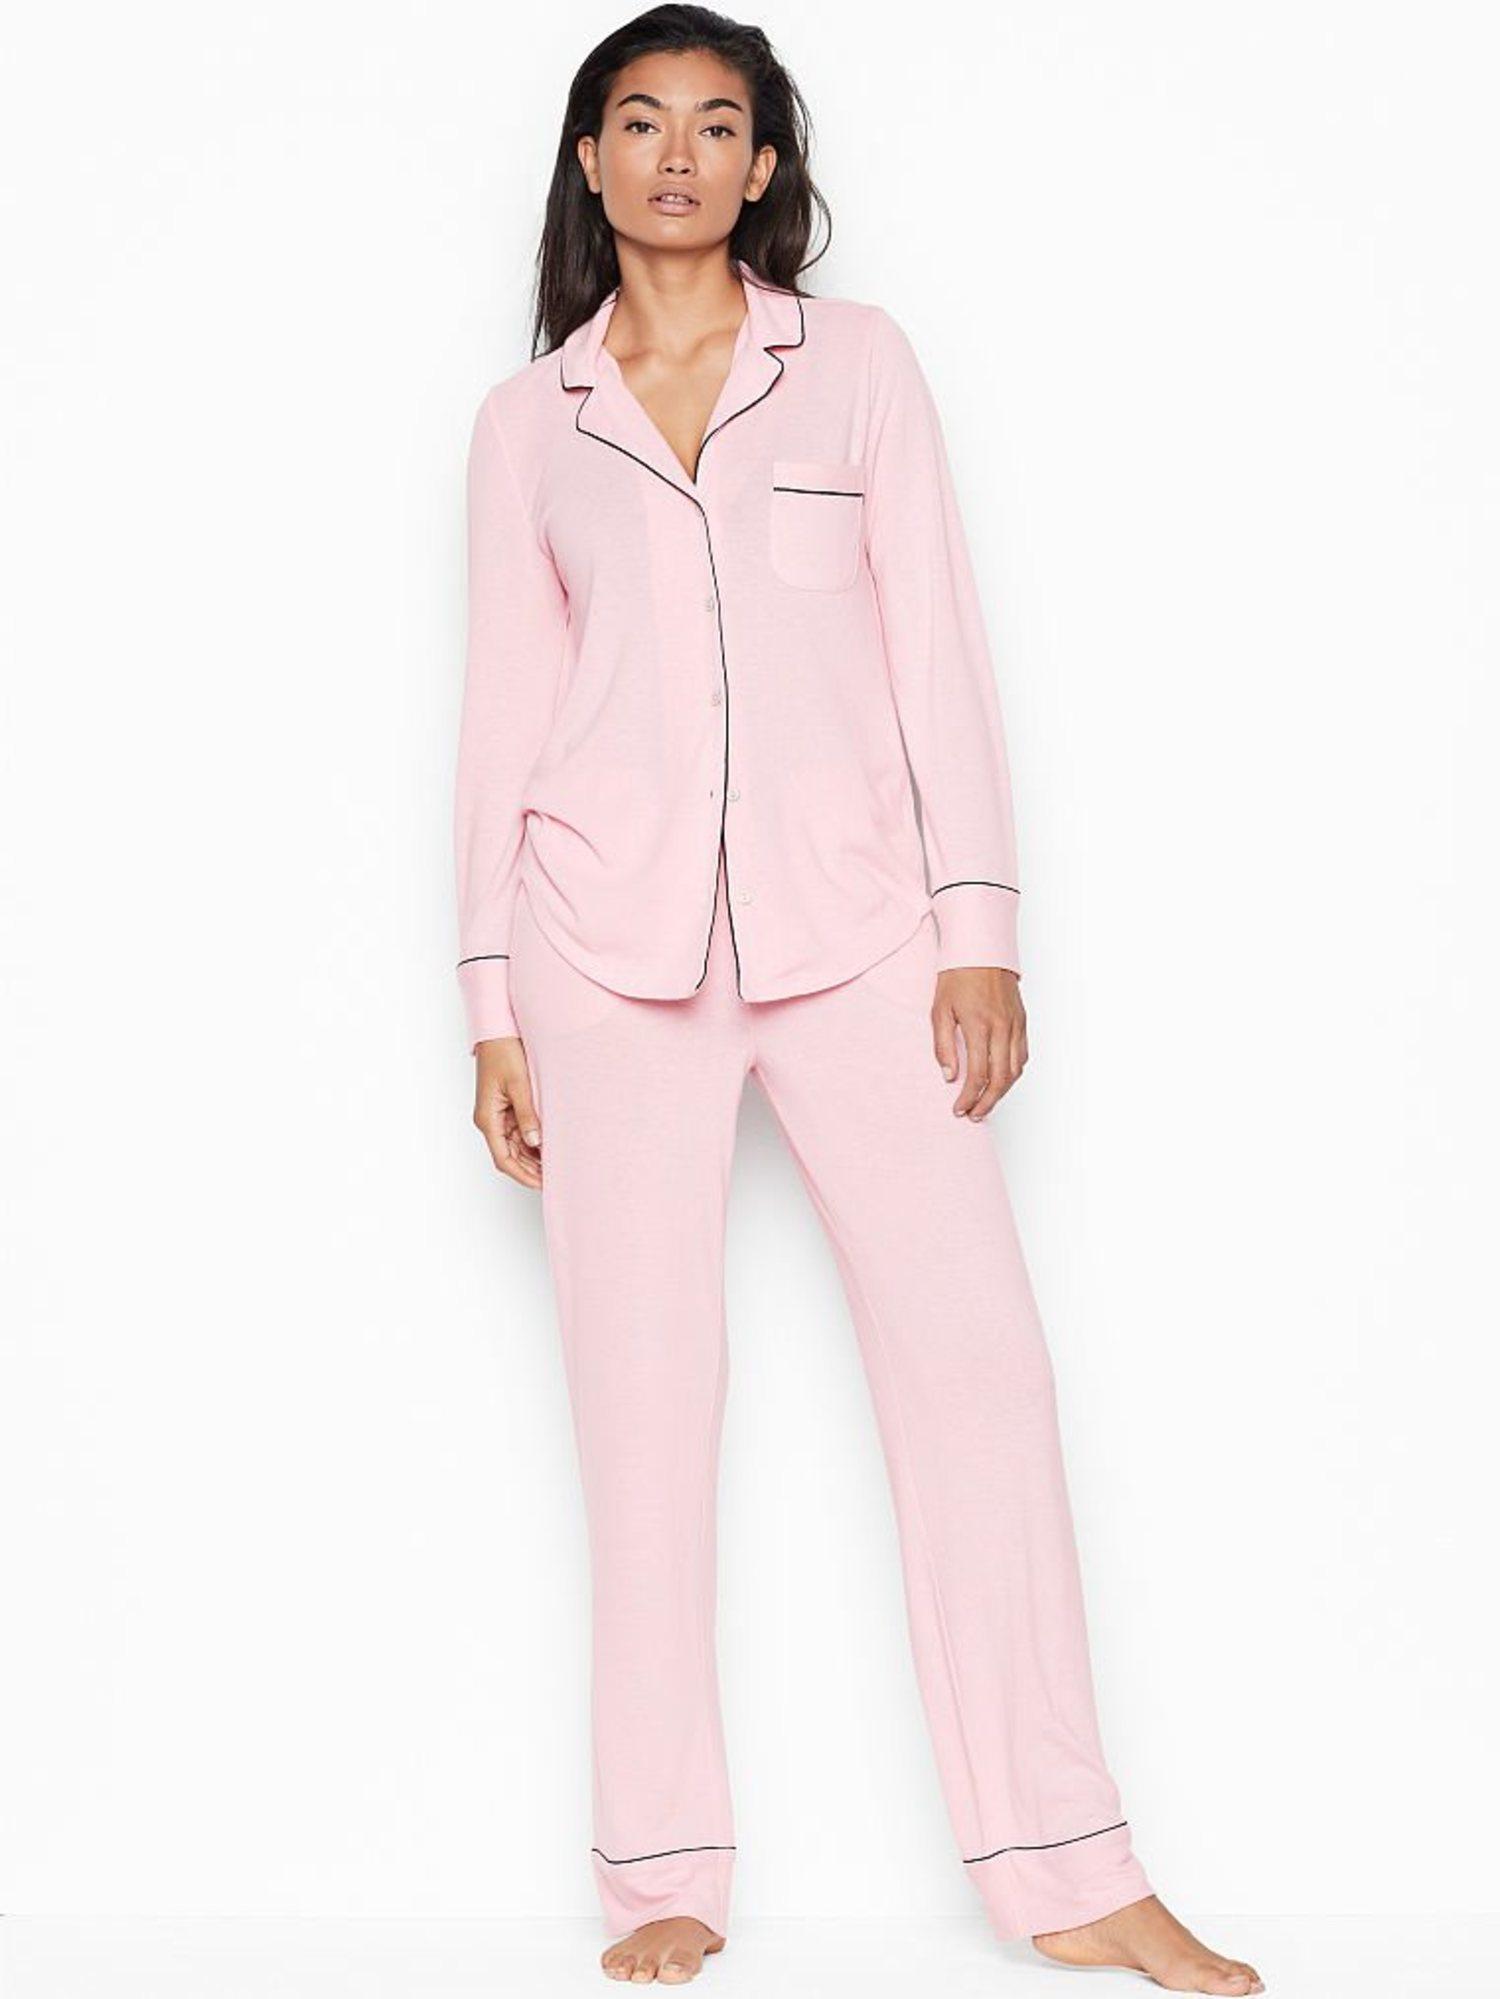 Pijama Fireside rosa.